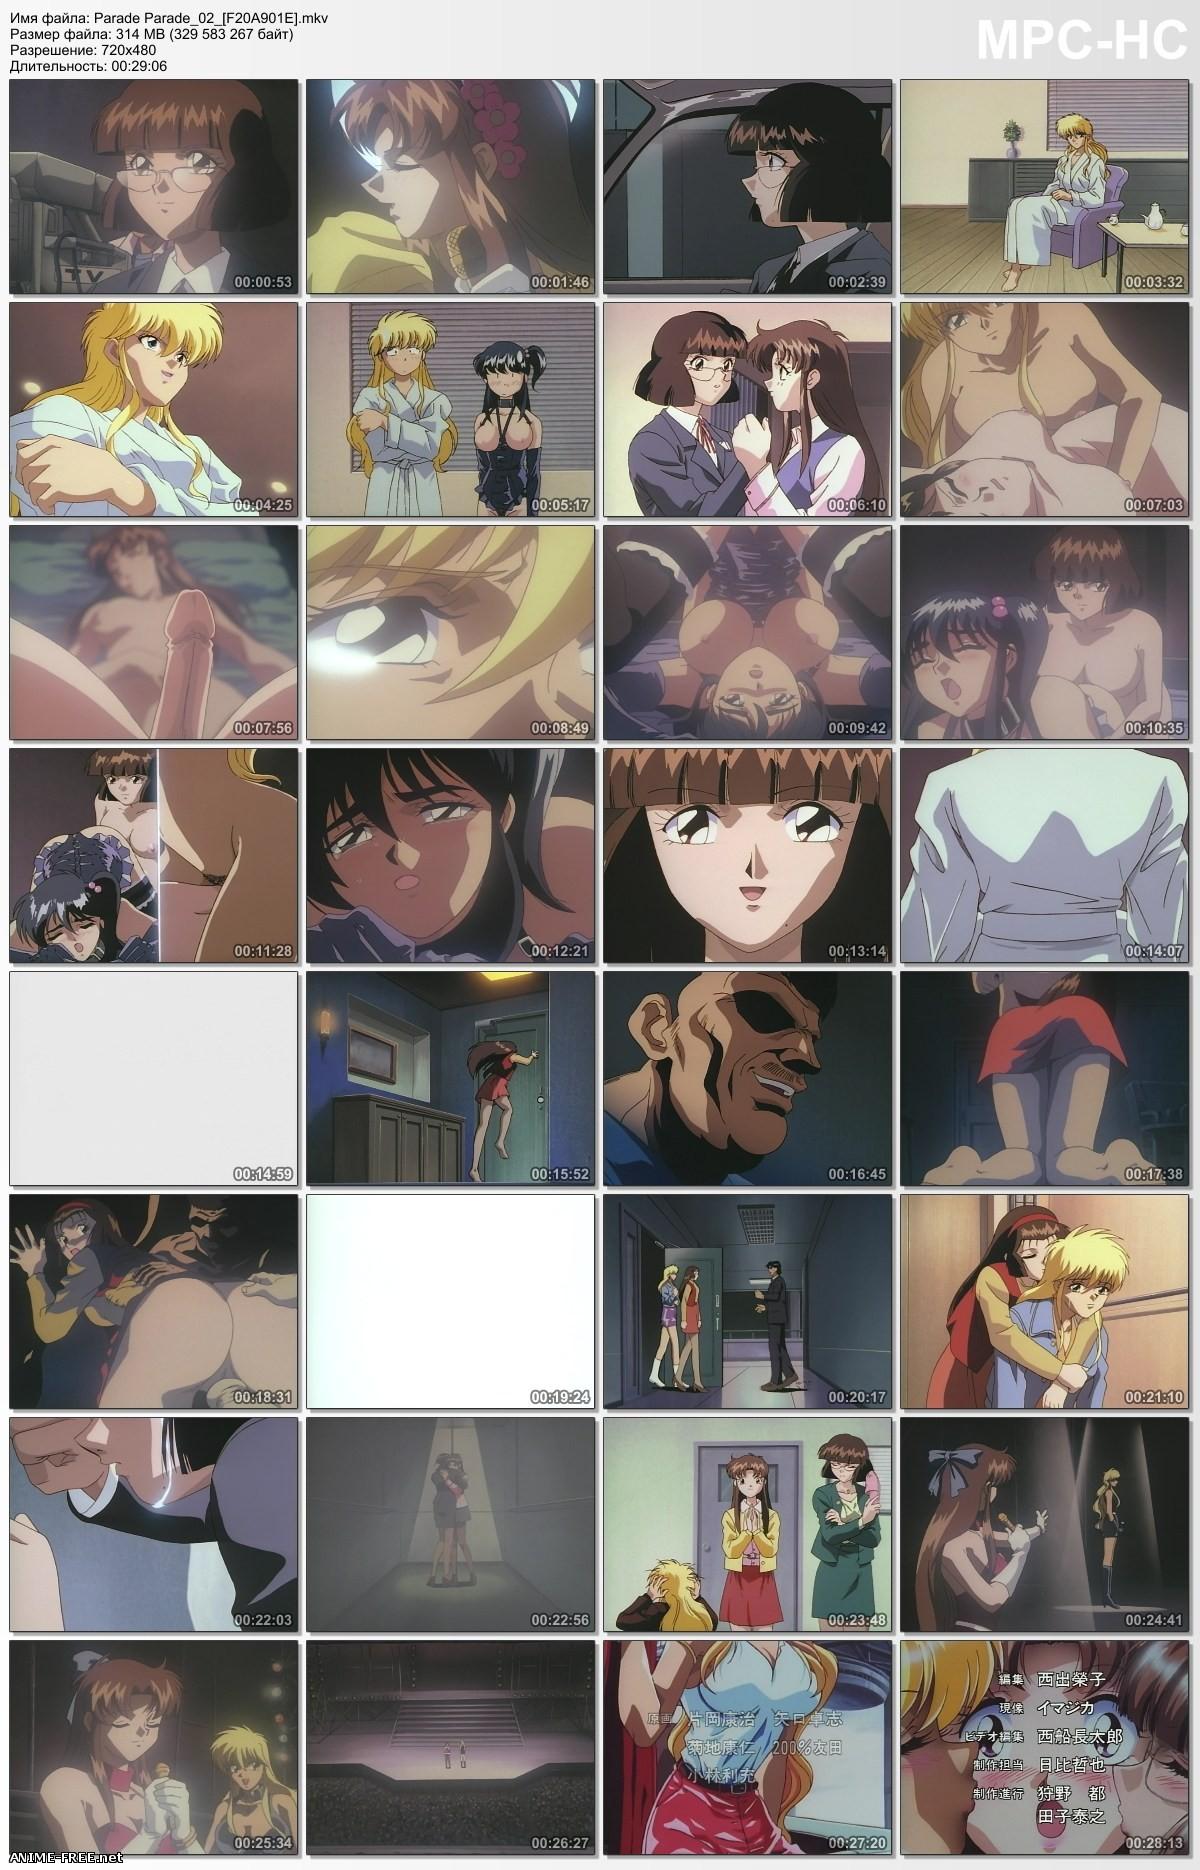 Parade Parade / Парад Парад [Ep.1-2] [RUS,ENG,JAP] Anime Hentai